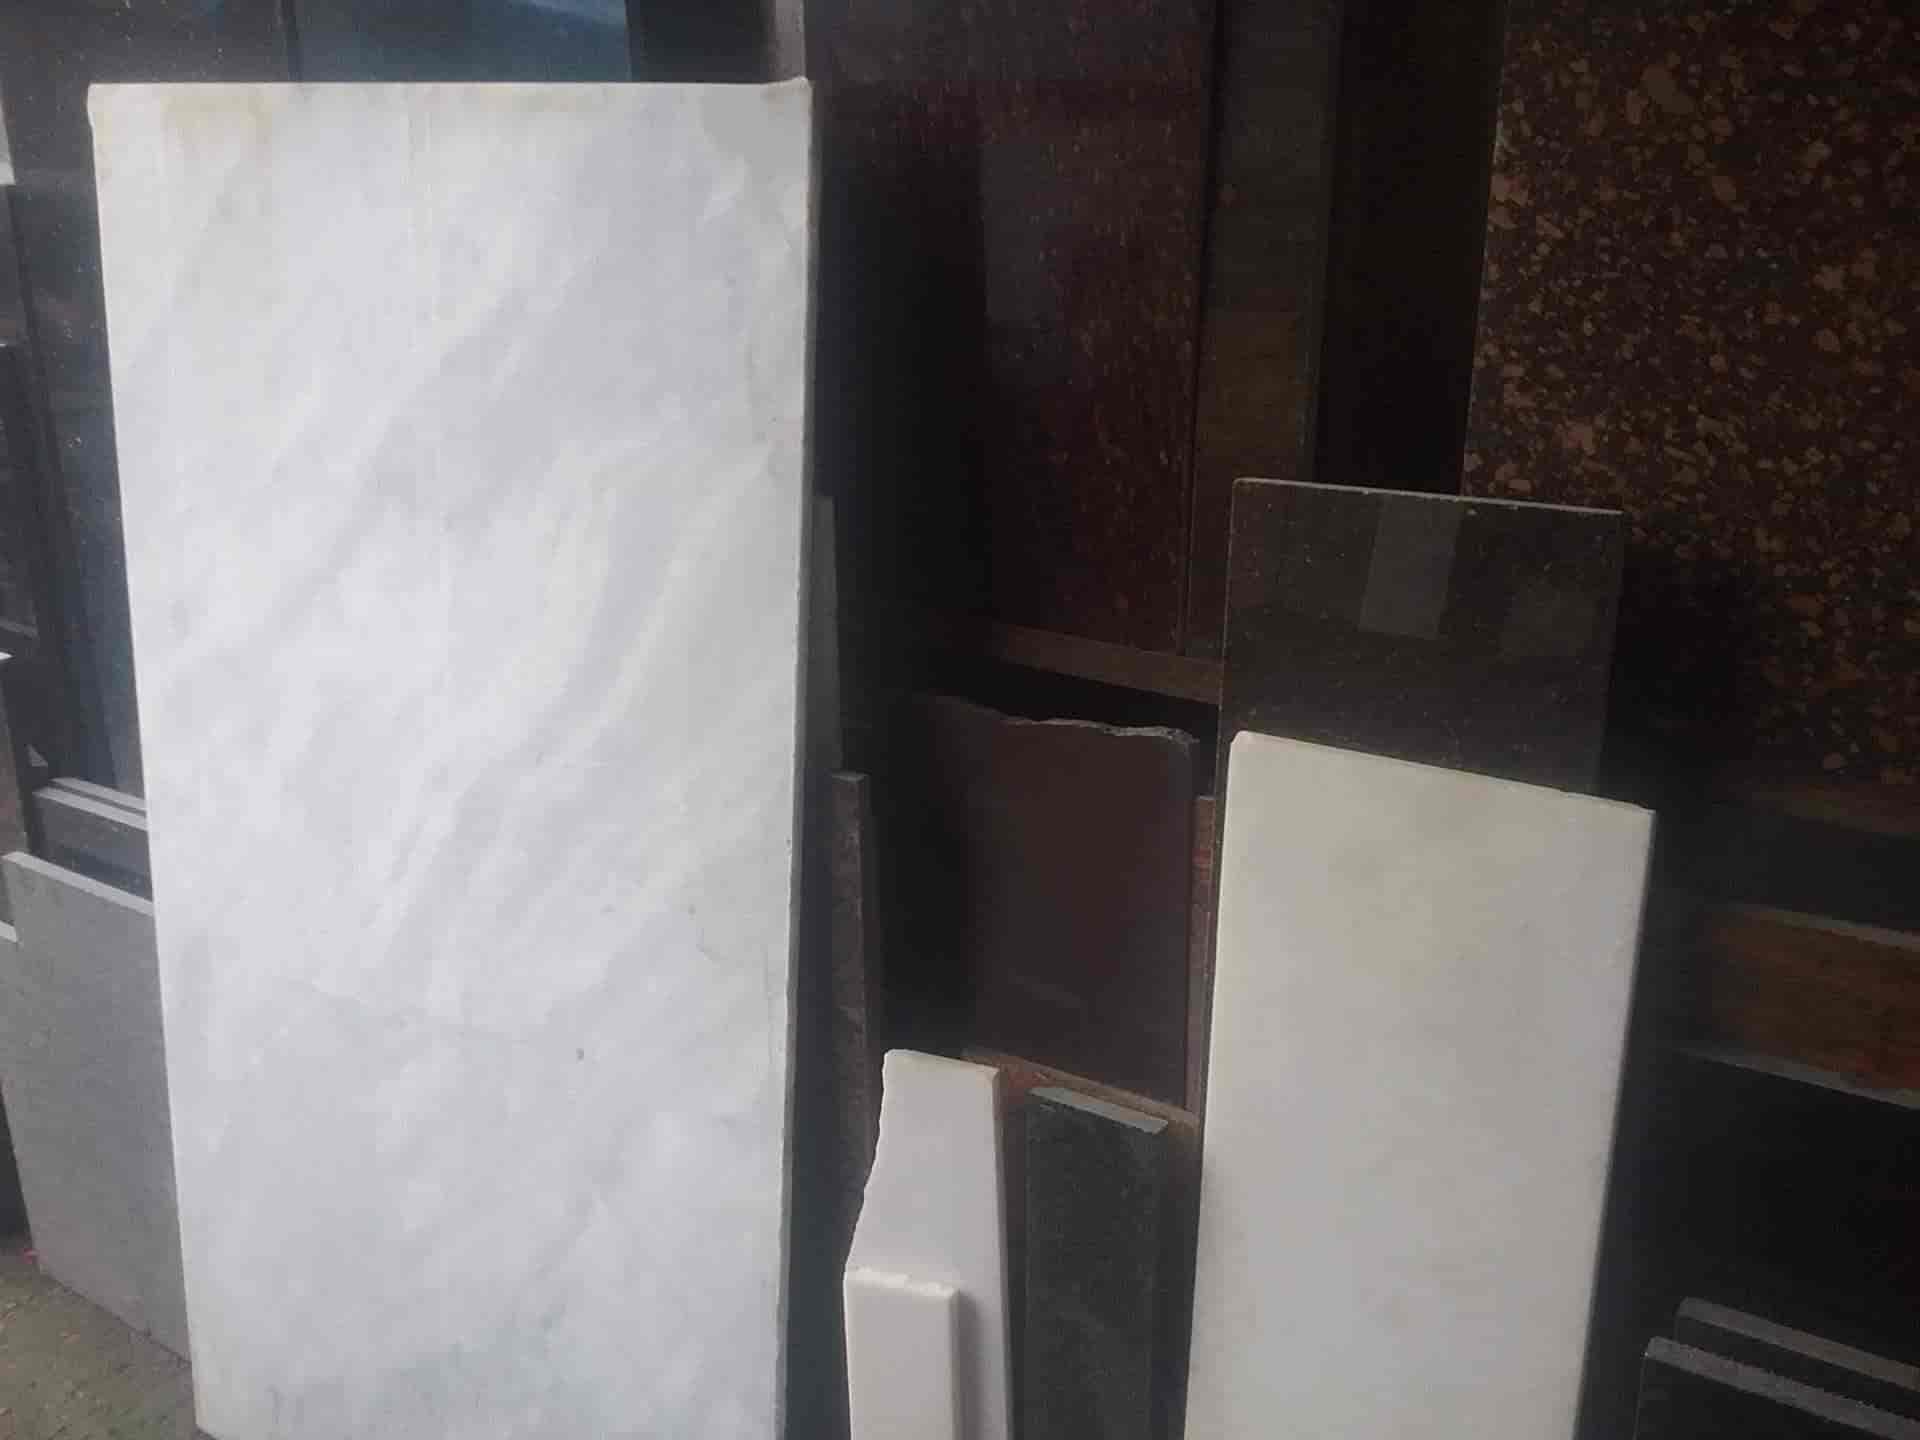 Shree Balaji Marble, Malad East - Tile Dealers in Mumbai - Justdial